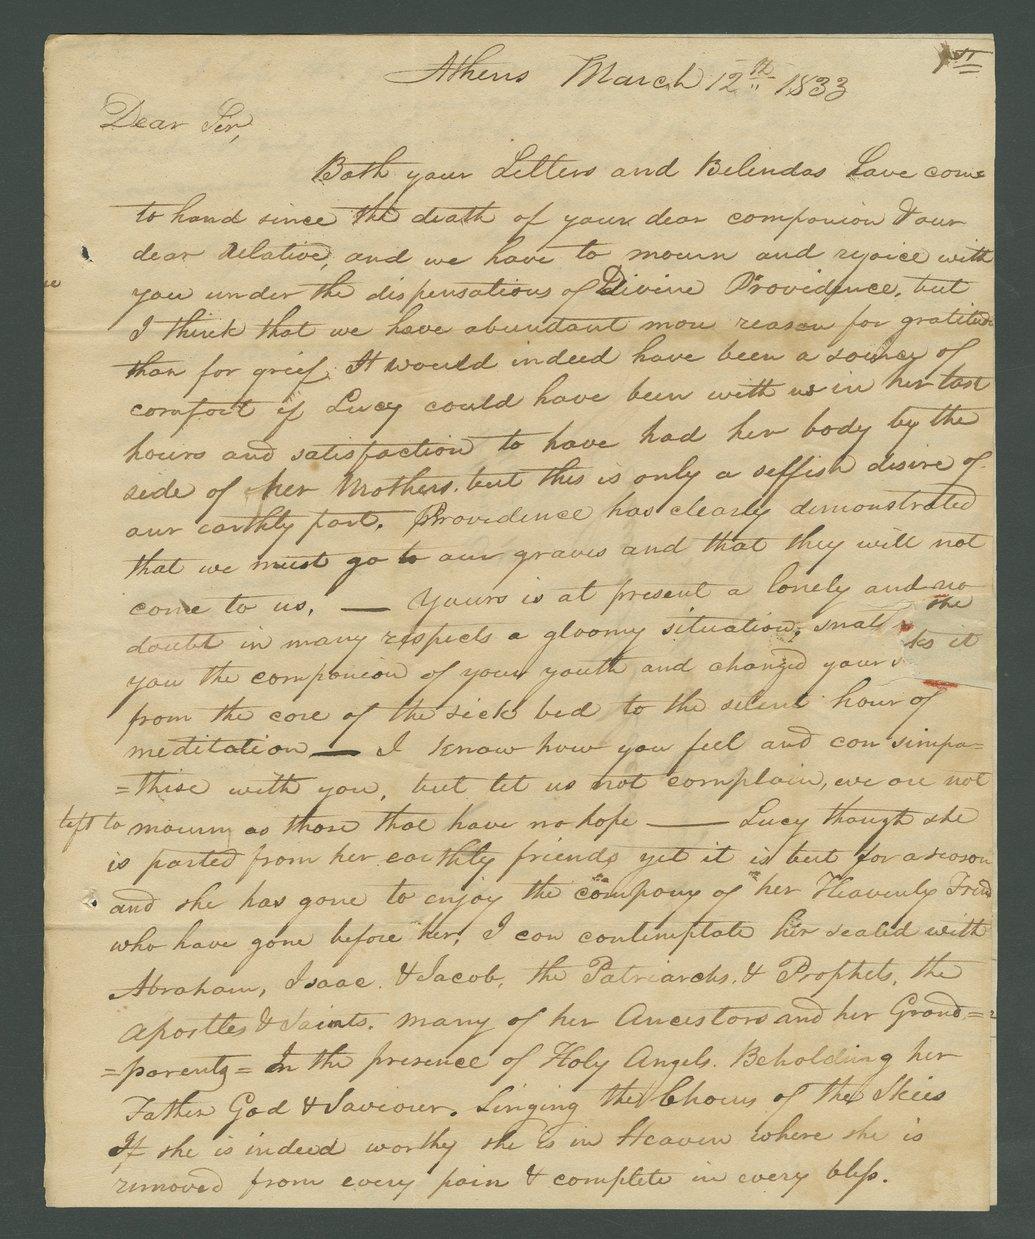 Joseph B. Miles to Lewis Allen Alderson - 11